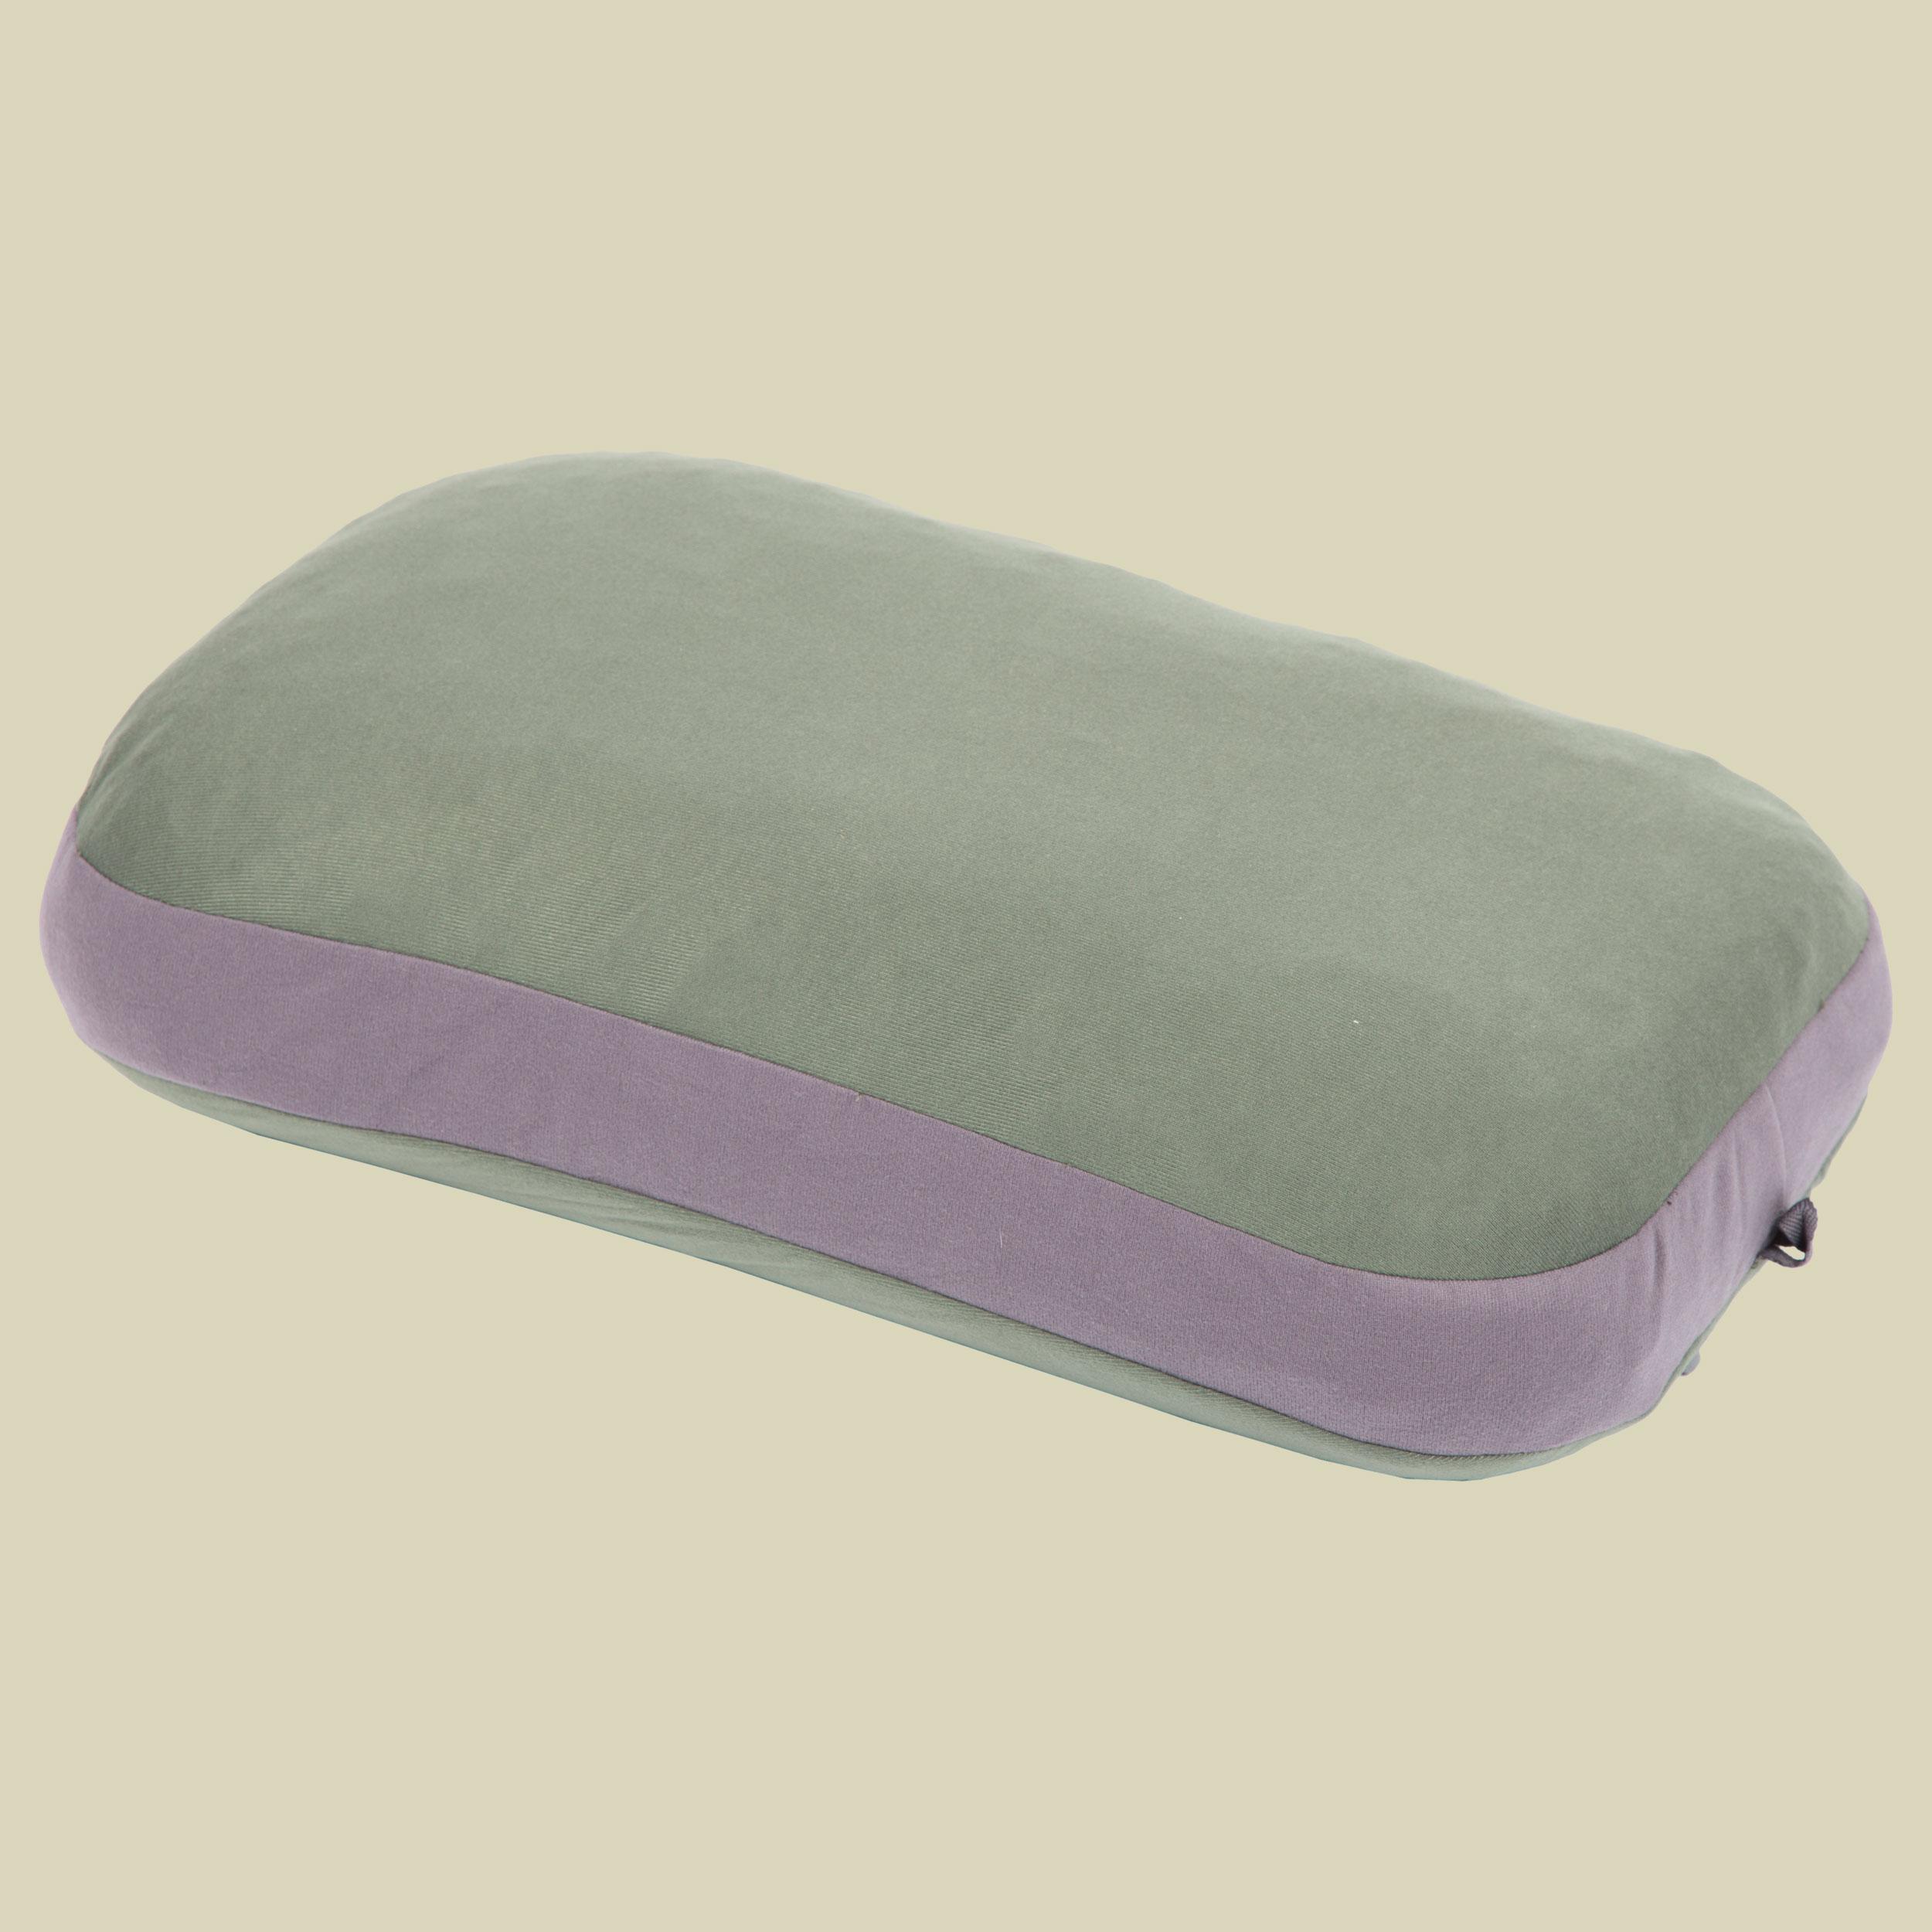 Exped REM Pillow L Kopfkissen Maße: 49 x 26 x 15 cm Farbe: green-grey